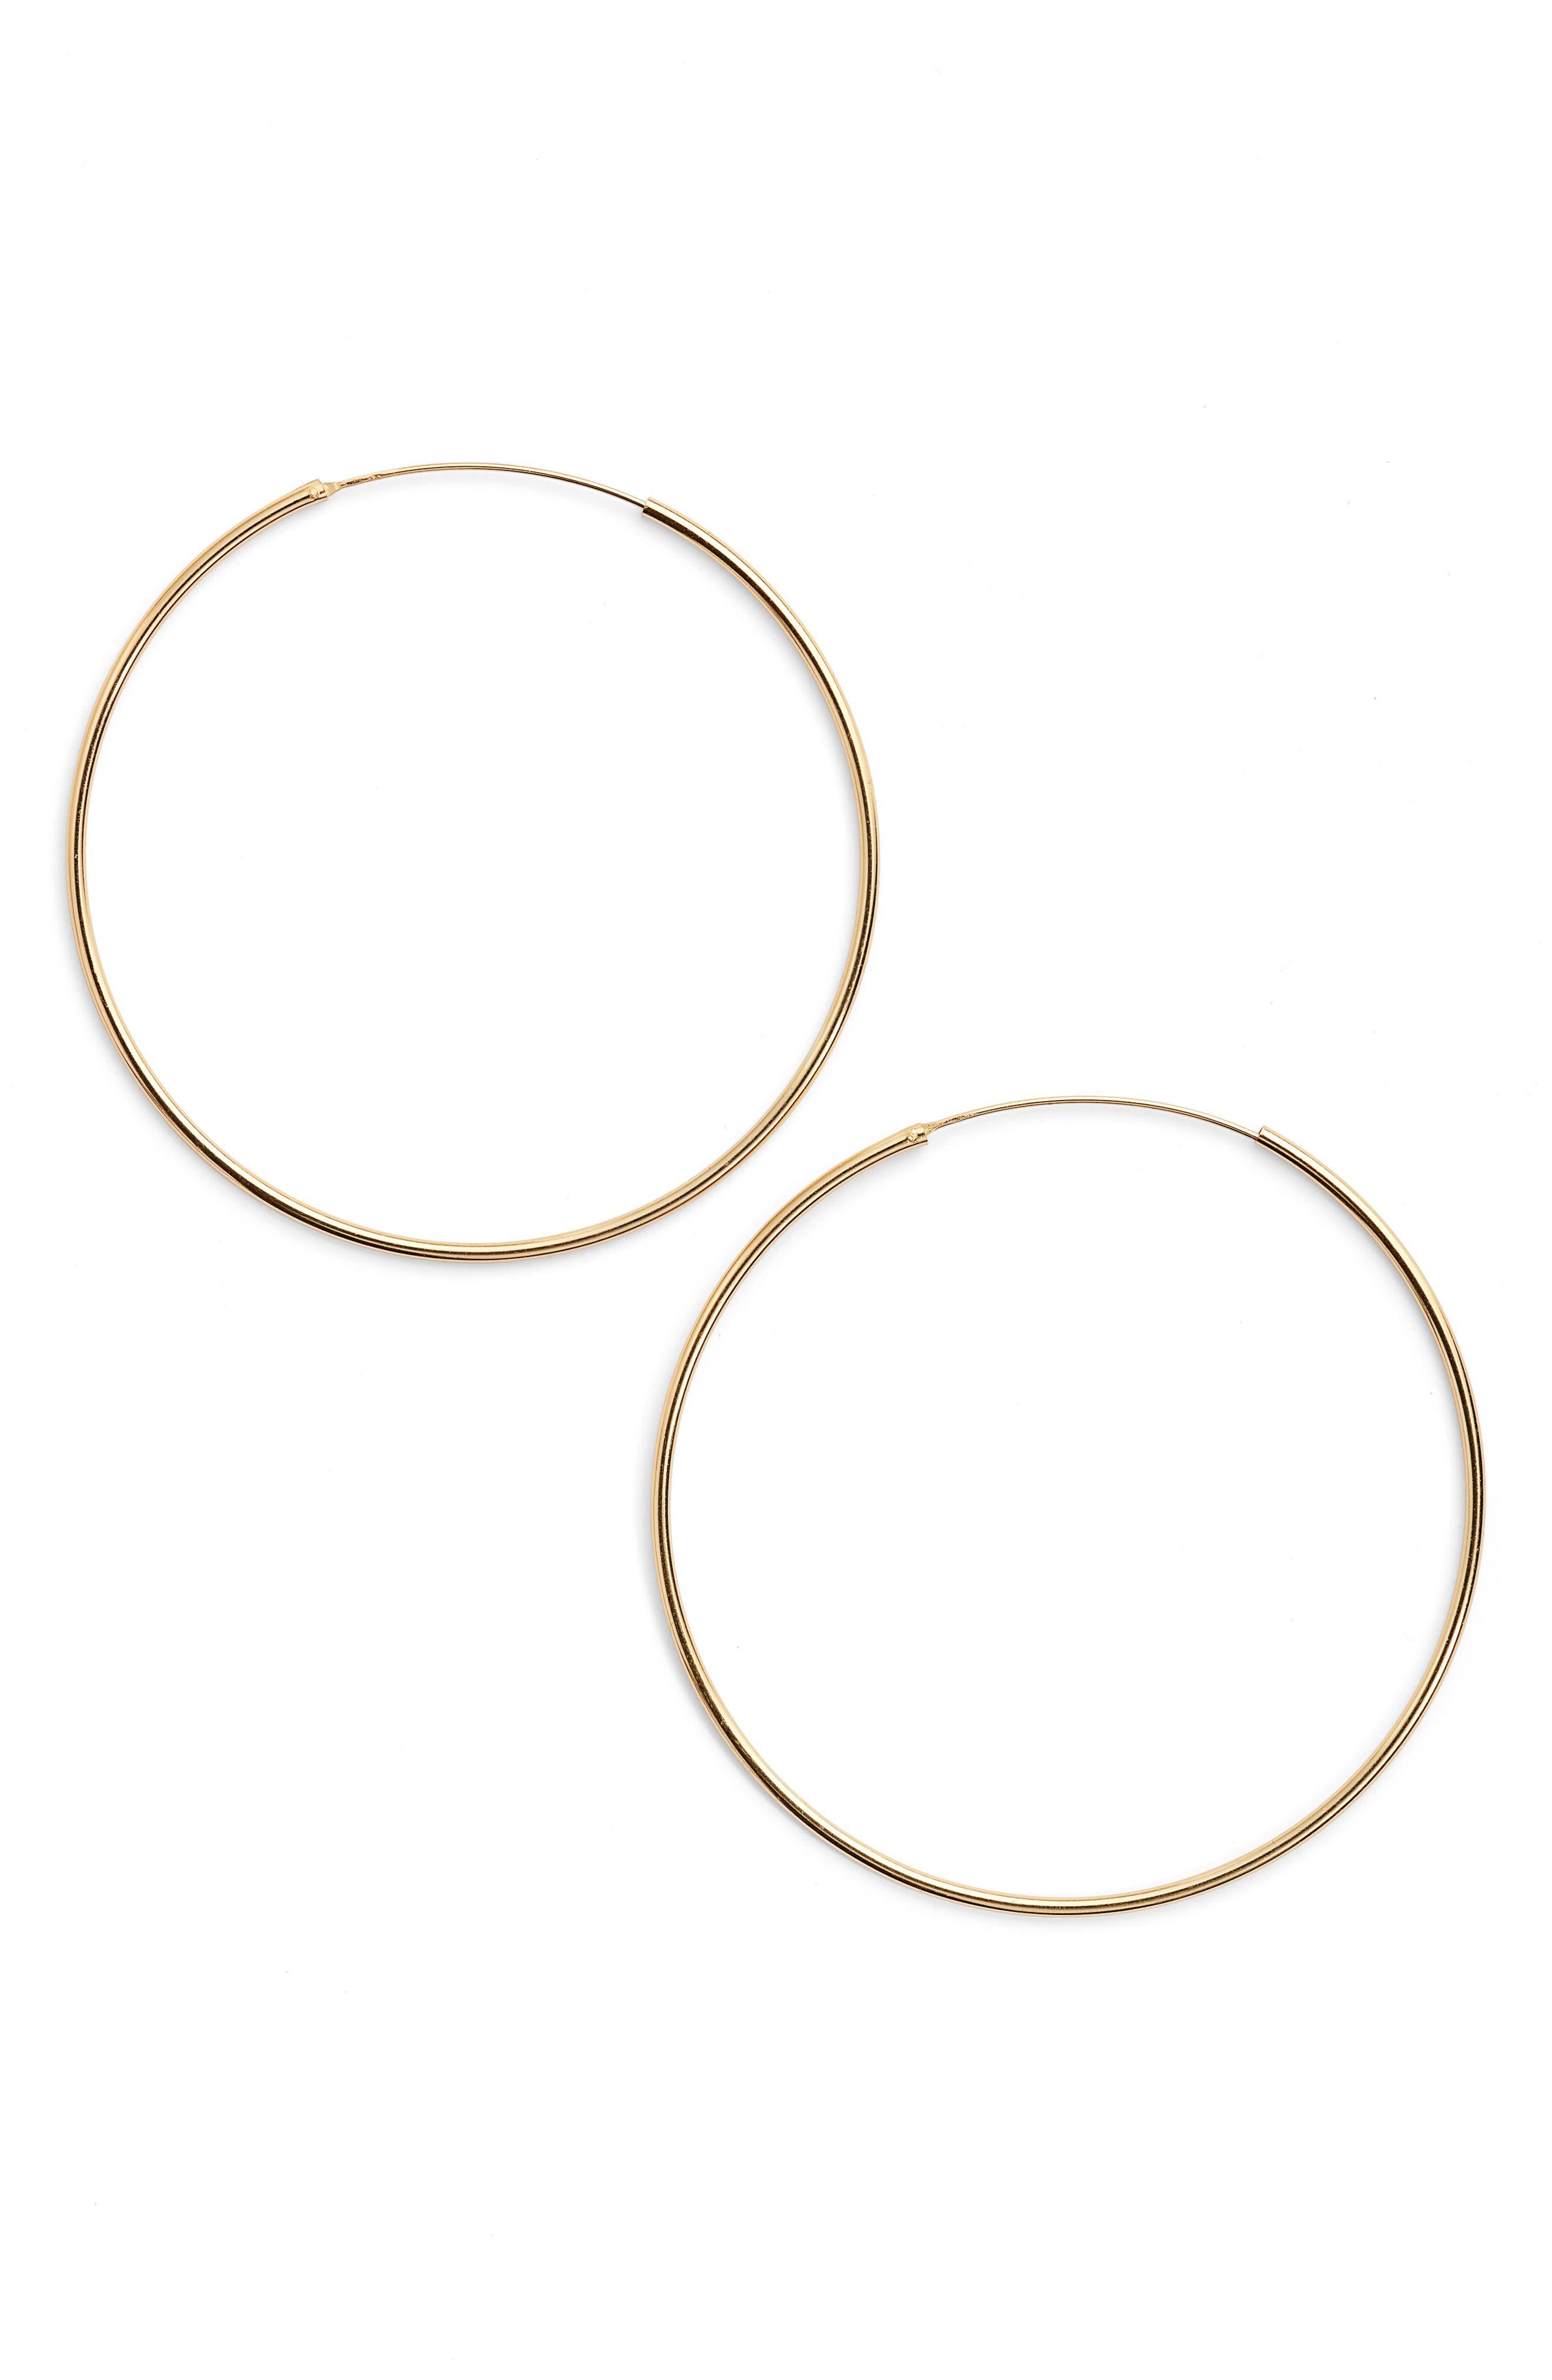 Main Image - Argento Vivo Endless Extra Large Hoop Earrings